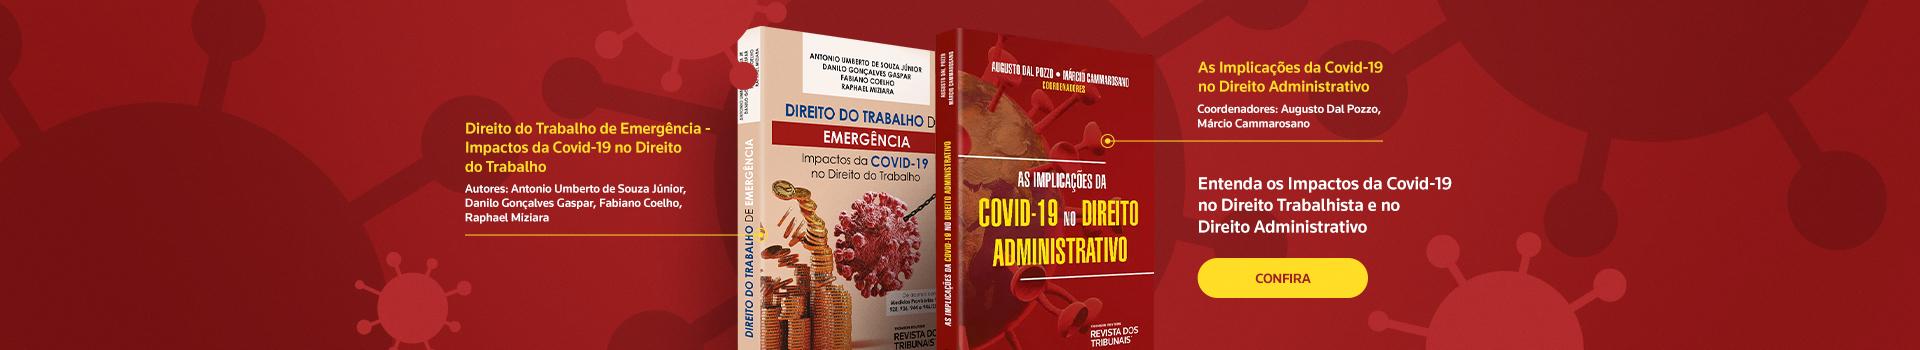 Obras - Covid-19